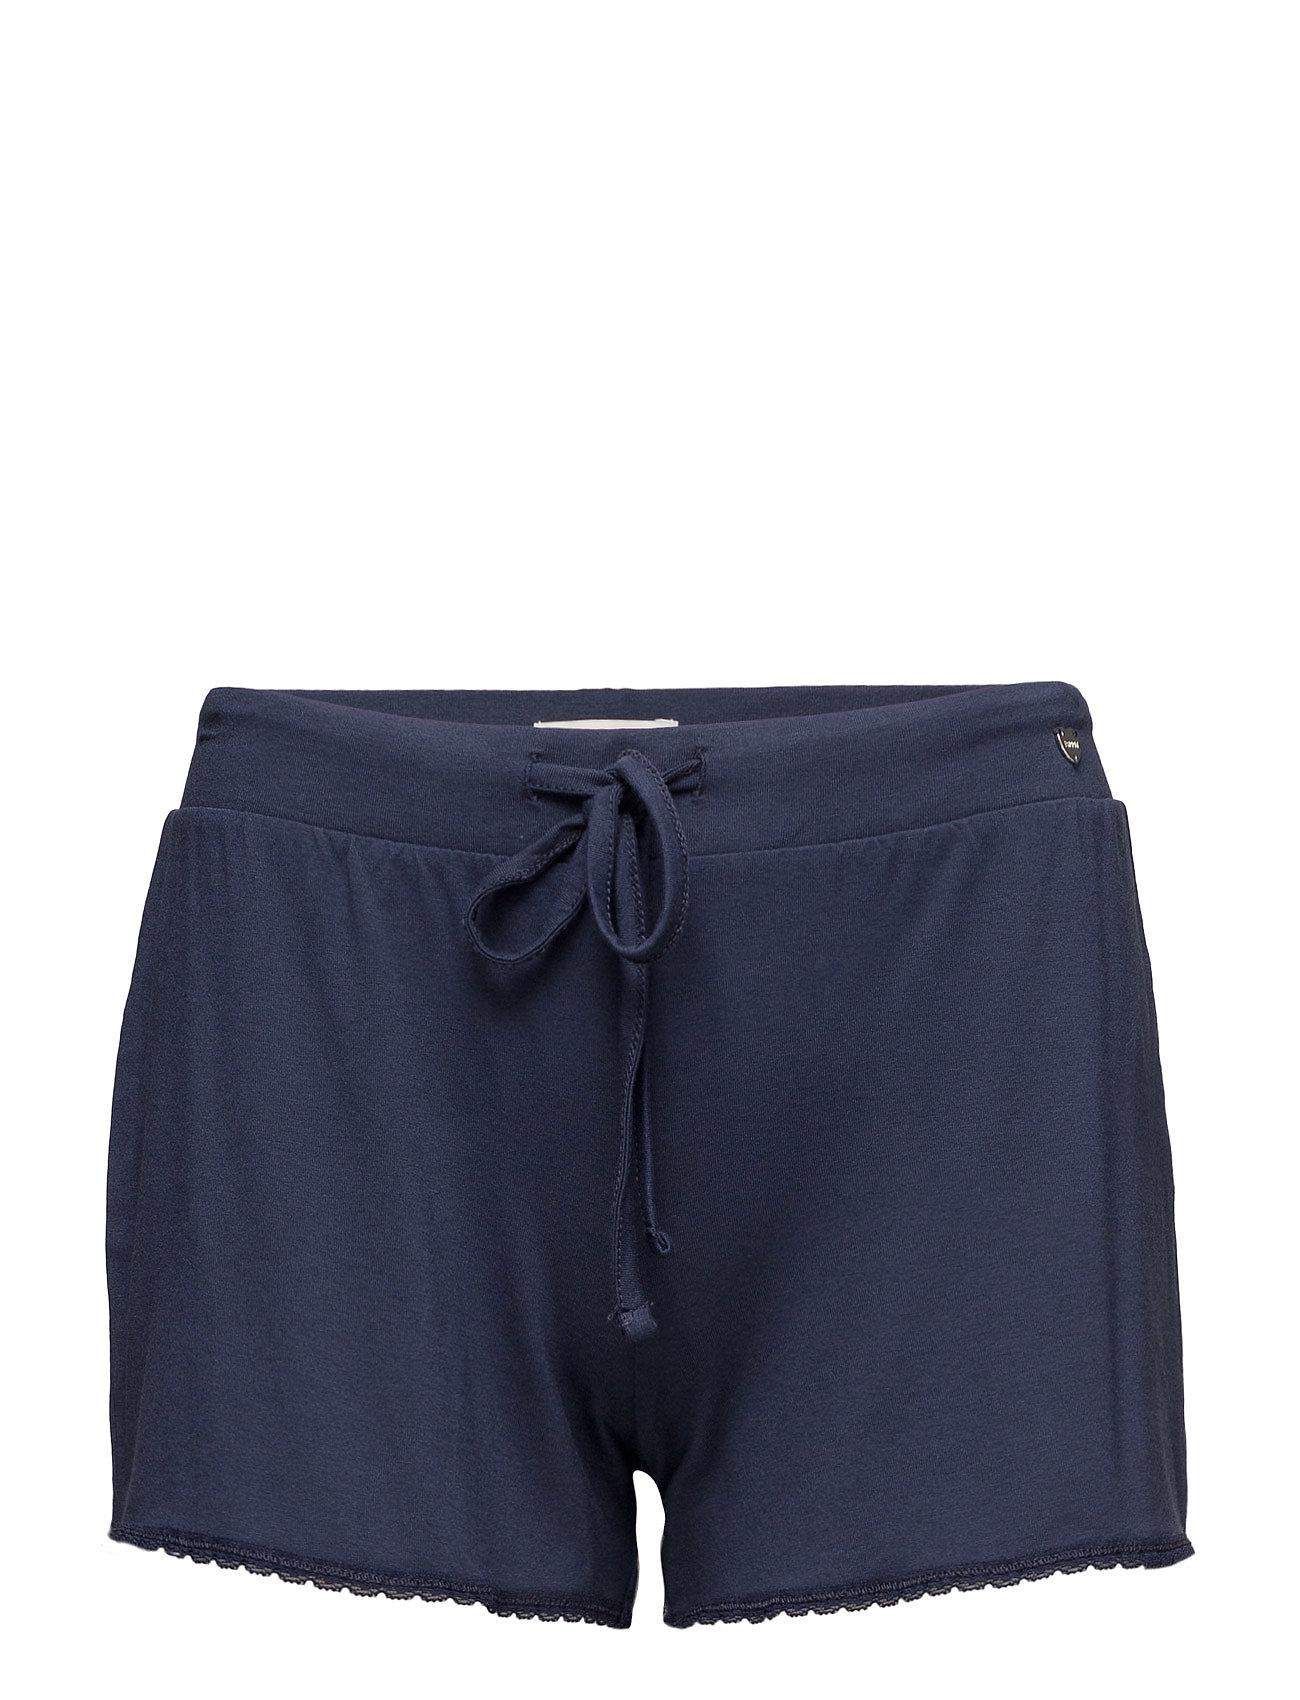 Image of Nightpants Shorts Blå Esprit Bodywear Women (2728527385)